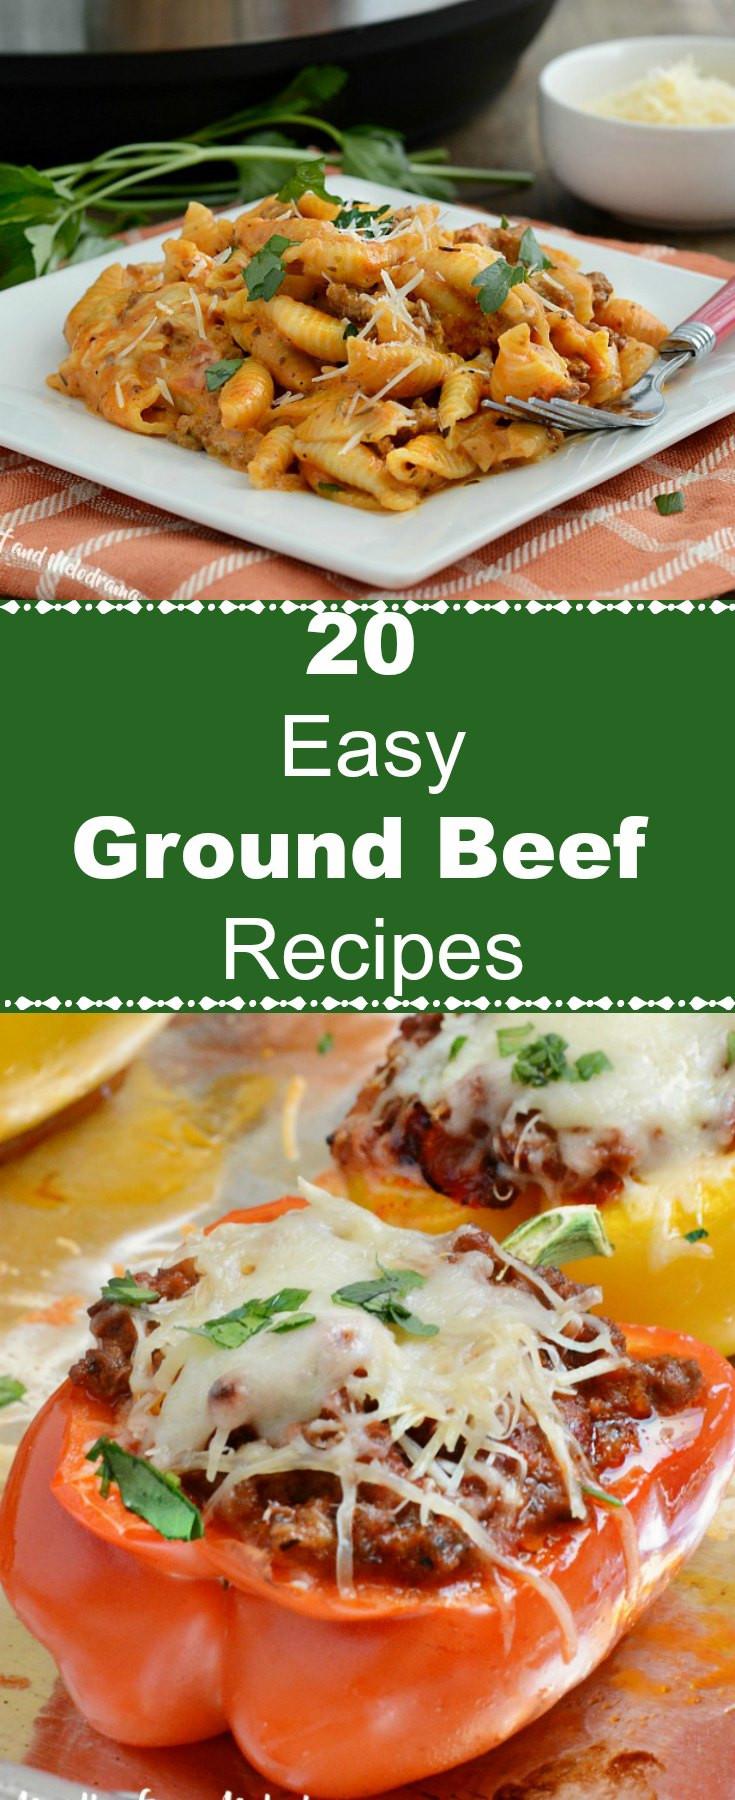 Easy Ground Beef Recipes  20 Easy Ground Beef Recipes Meatloaf and Melodrama